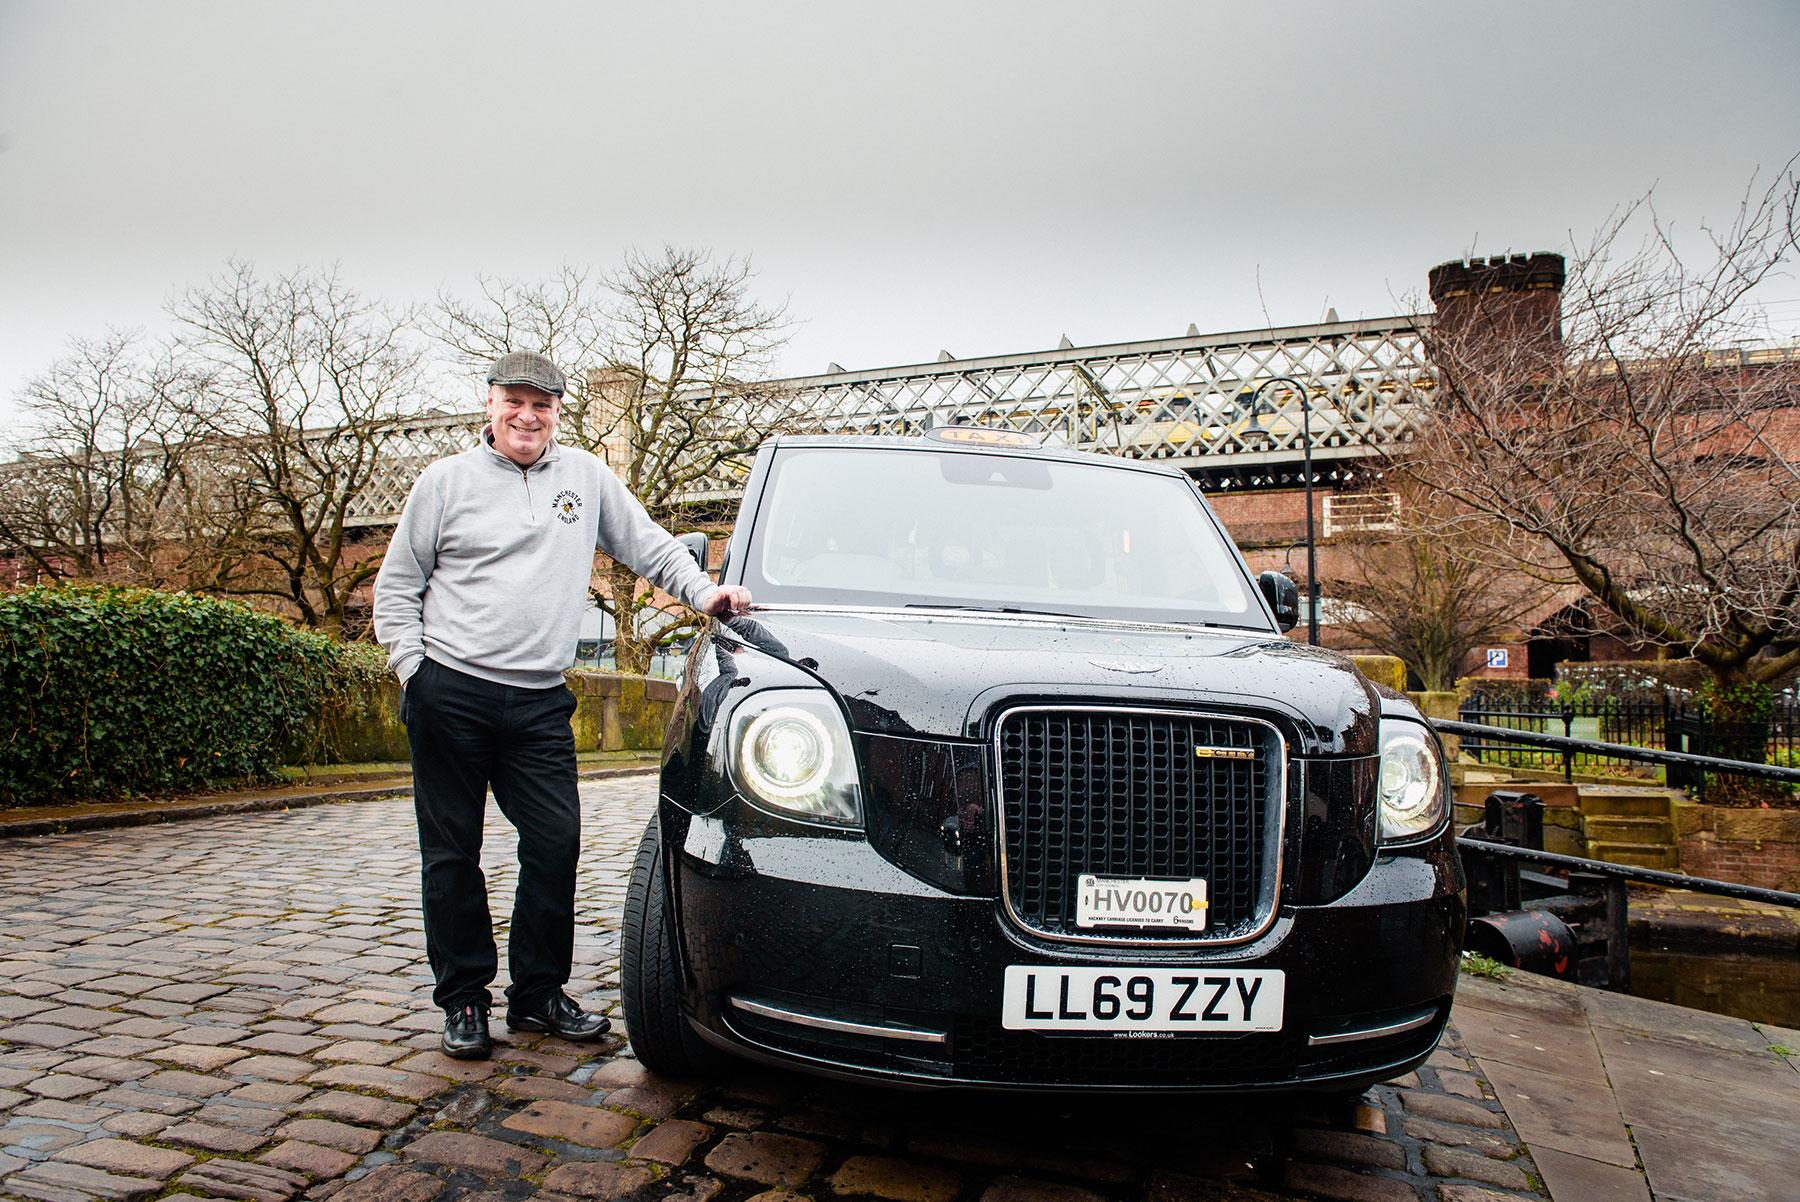 electric black cab in castlefield